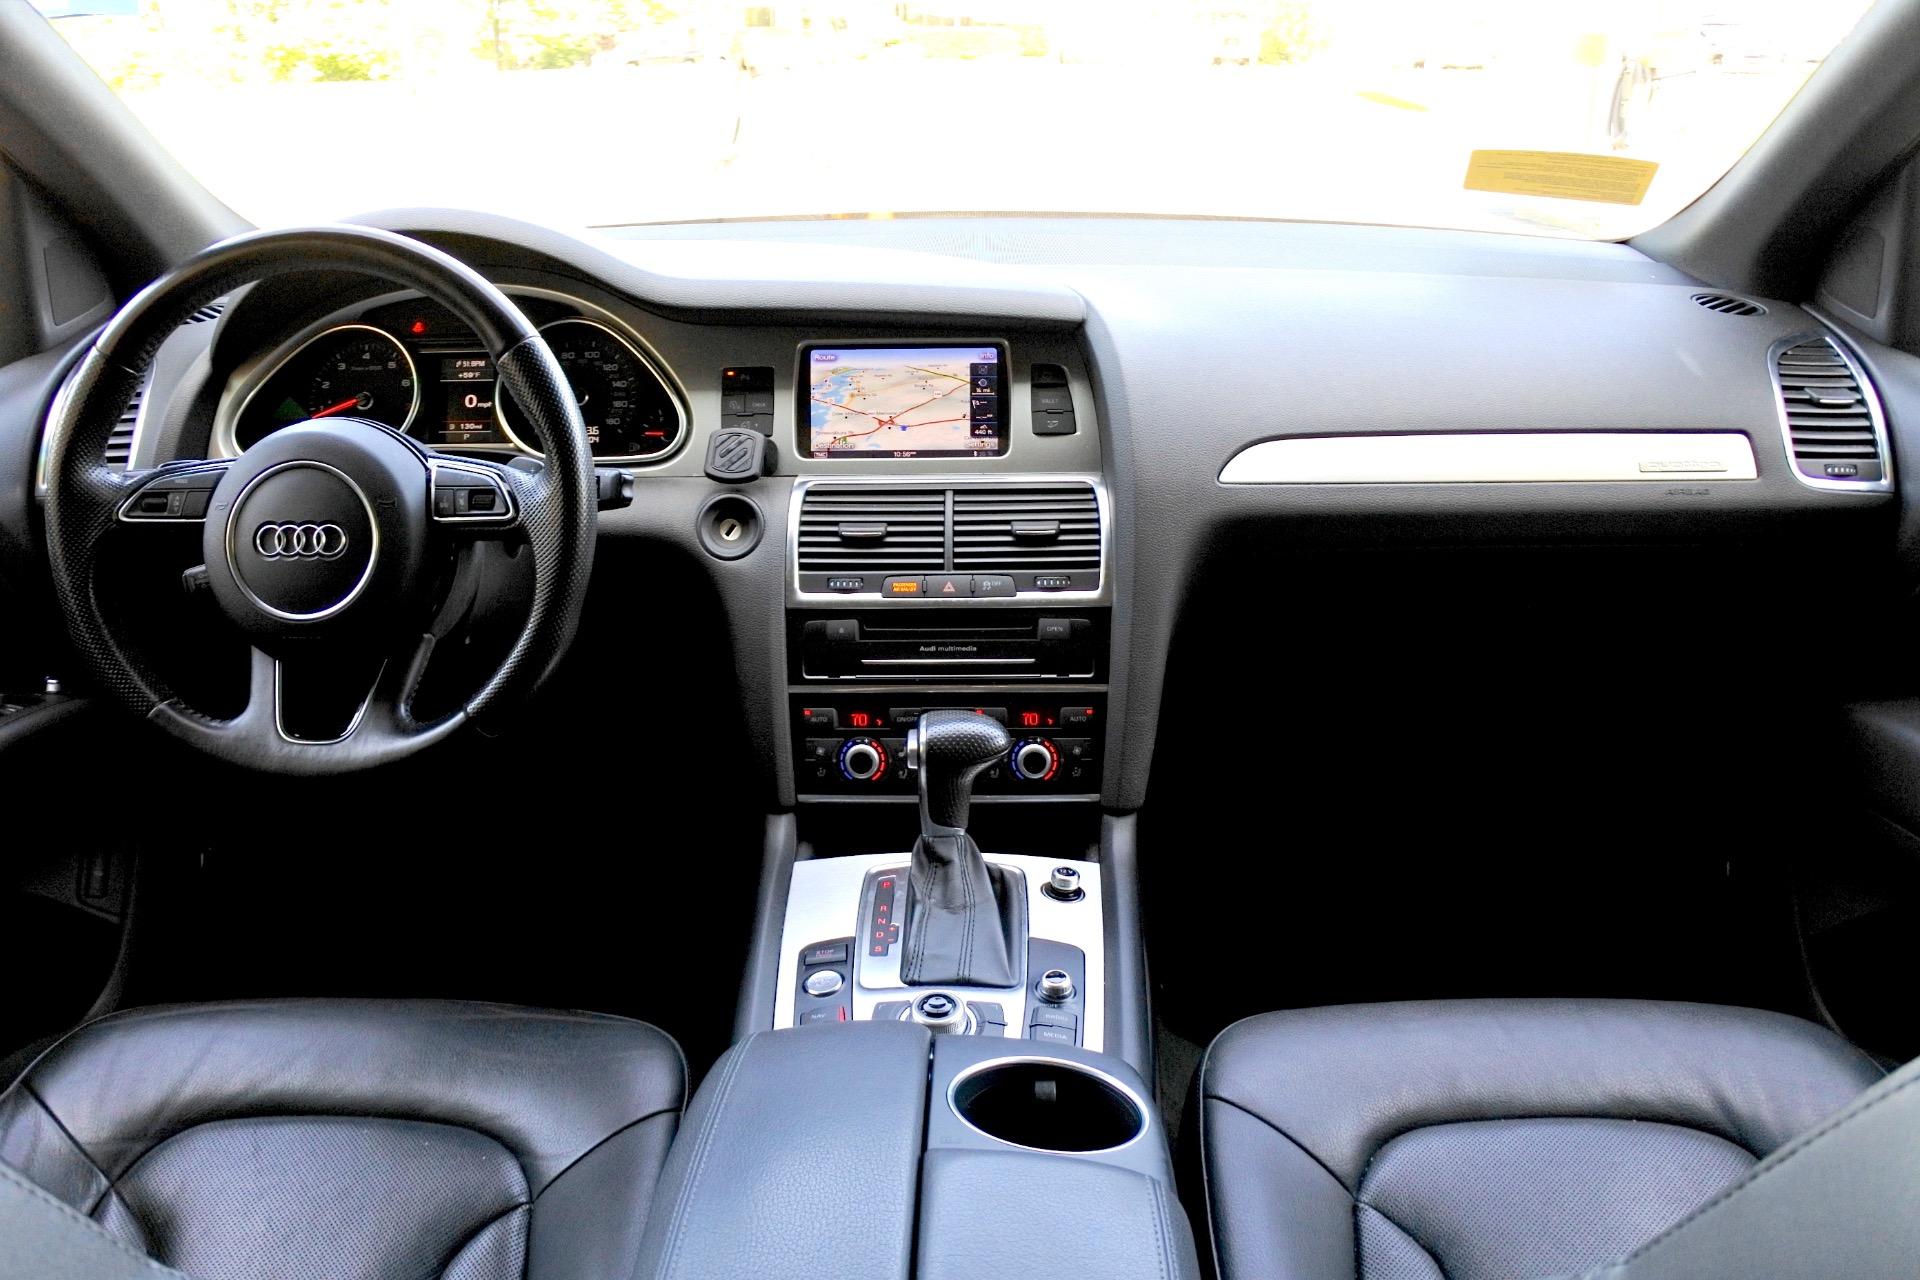 Used 2014 Audi Q7 3.0T S line Prestige Used 2014 Audi Q7 3.0T S line Prestige for sale  at Metro West Motorcars LLC in Shrewsbury MA 8